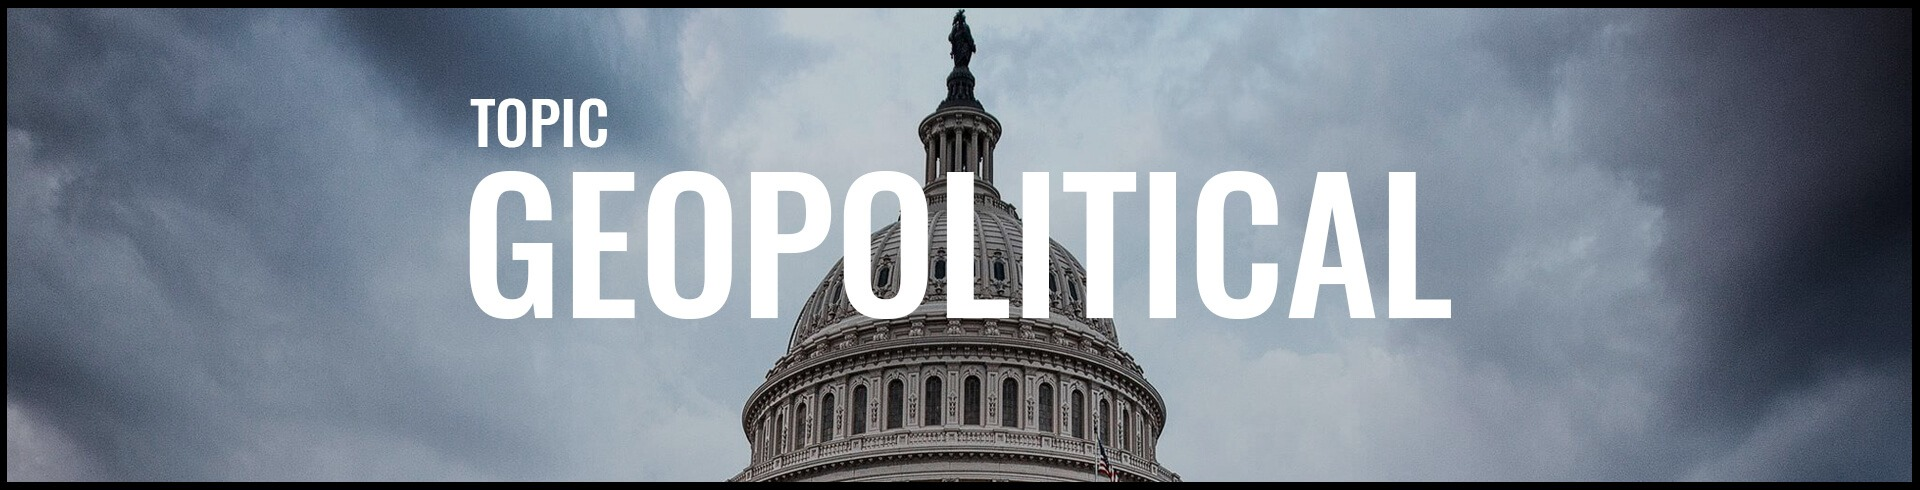 Geopolitical-Great-Awakening-Report-2